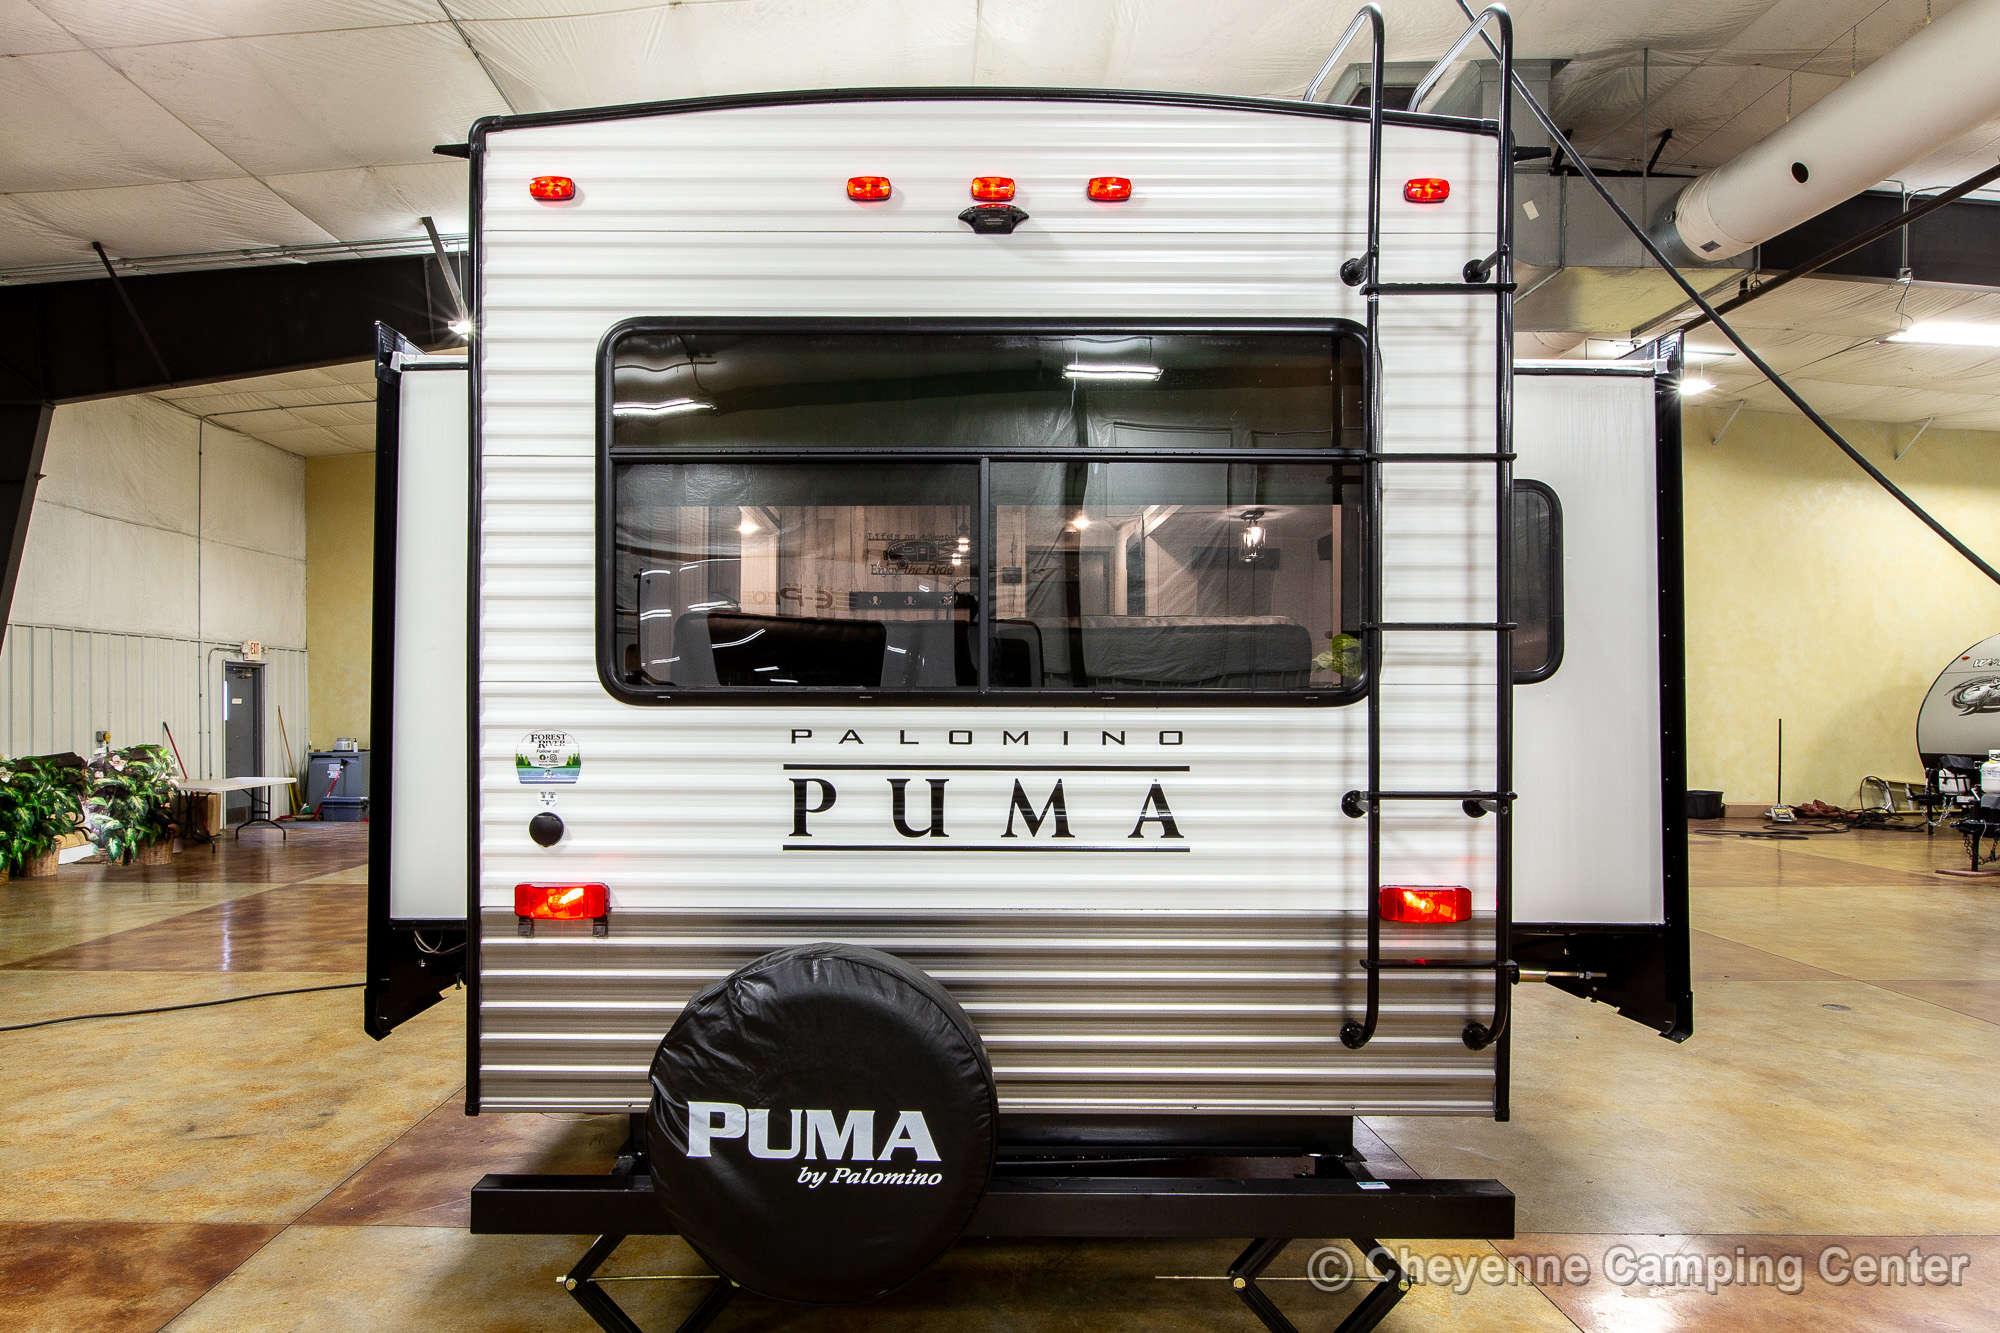 2022 Palomino Puma 31RLQS Travel Trailer Exterior Image